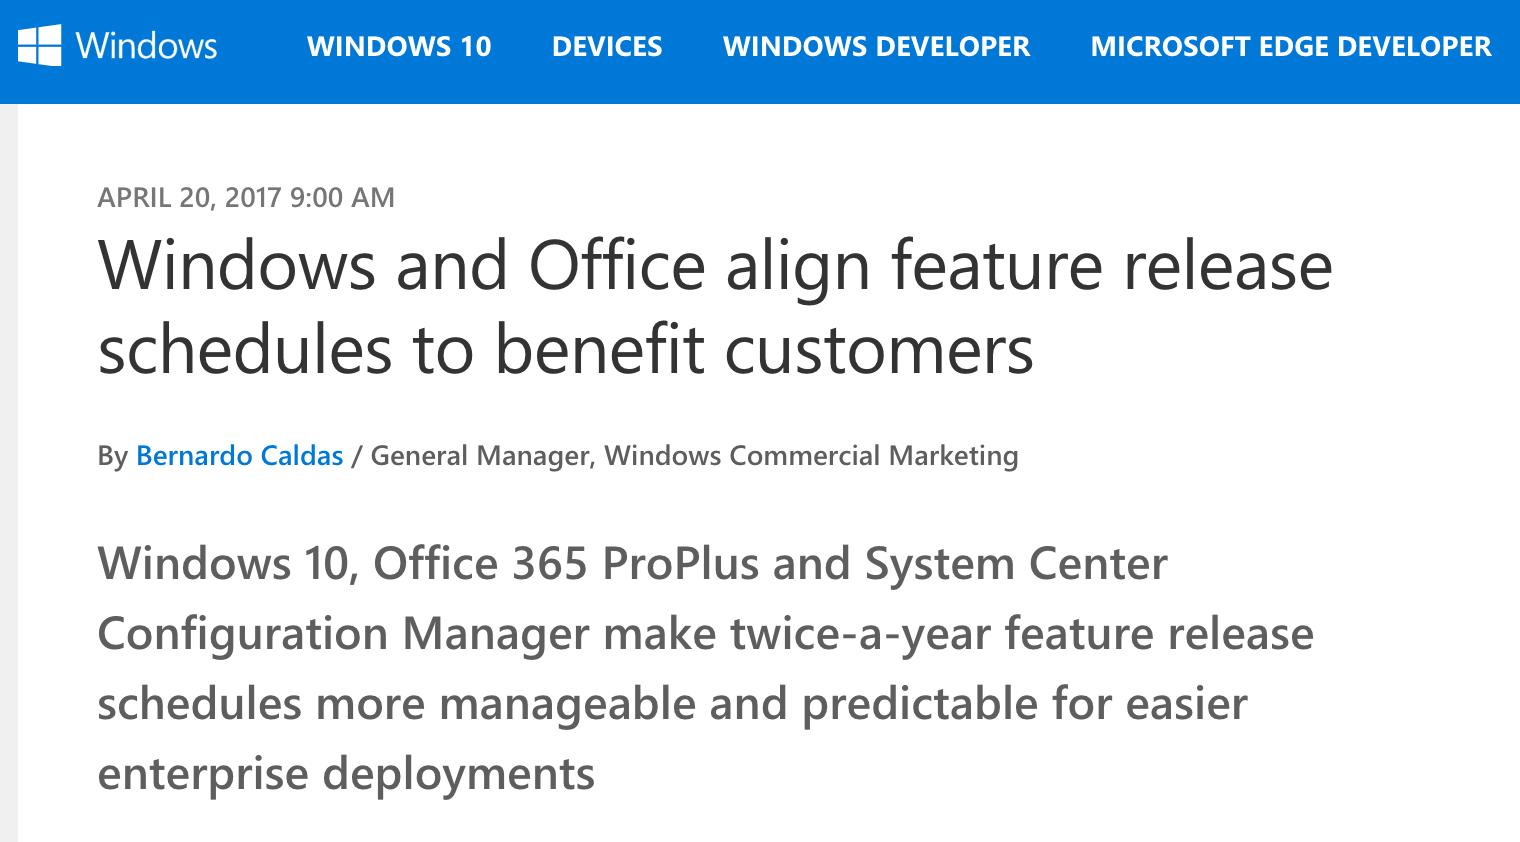 Windows 调整为一年两次大更新,下版本 9 月推出-芊雅企服